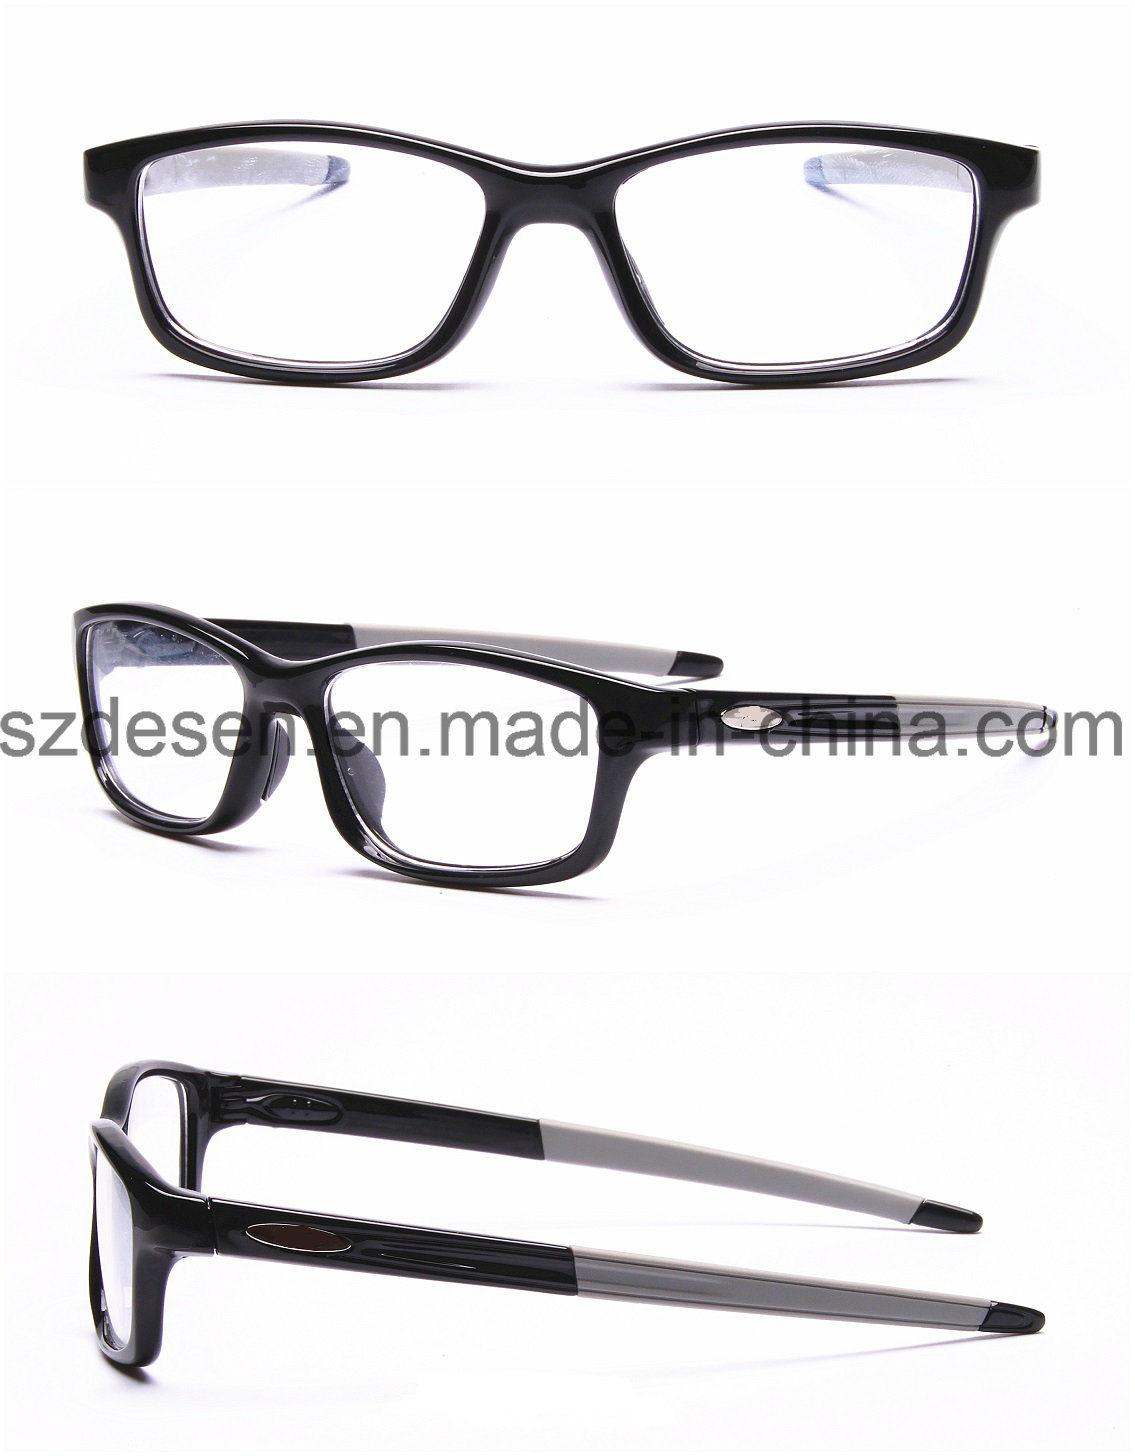 China Wholesale High Quality Sport Style Tr90 Eyeglass Frame Optical ...